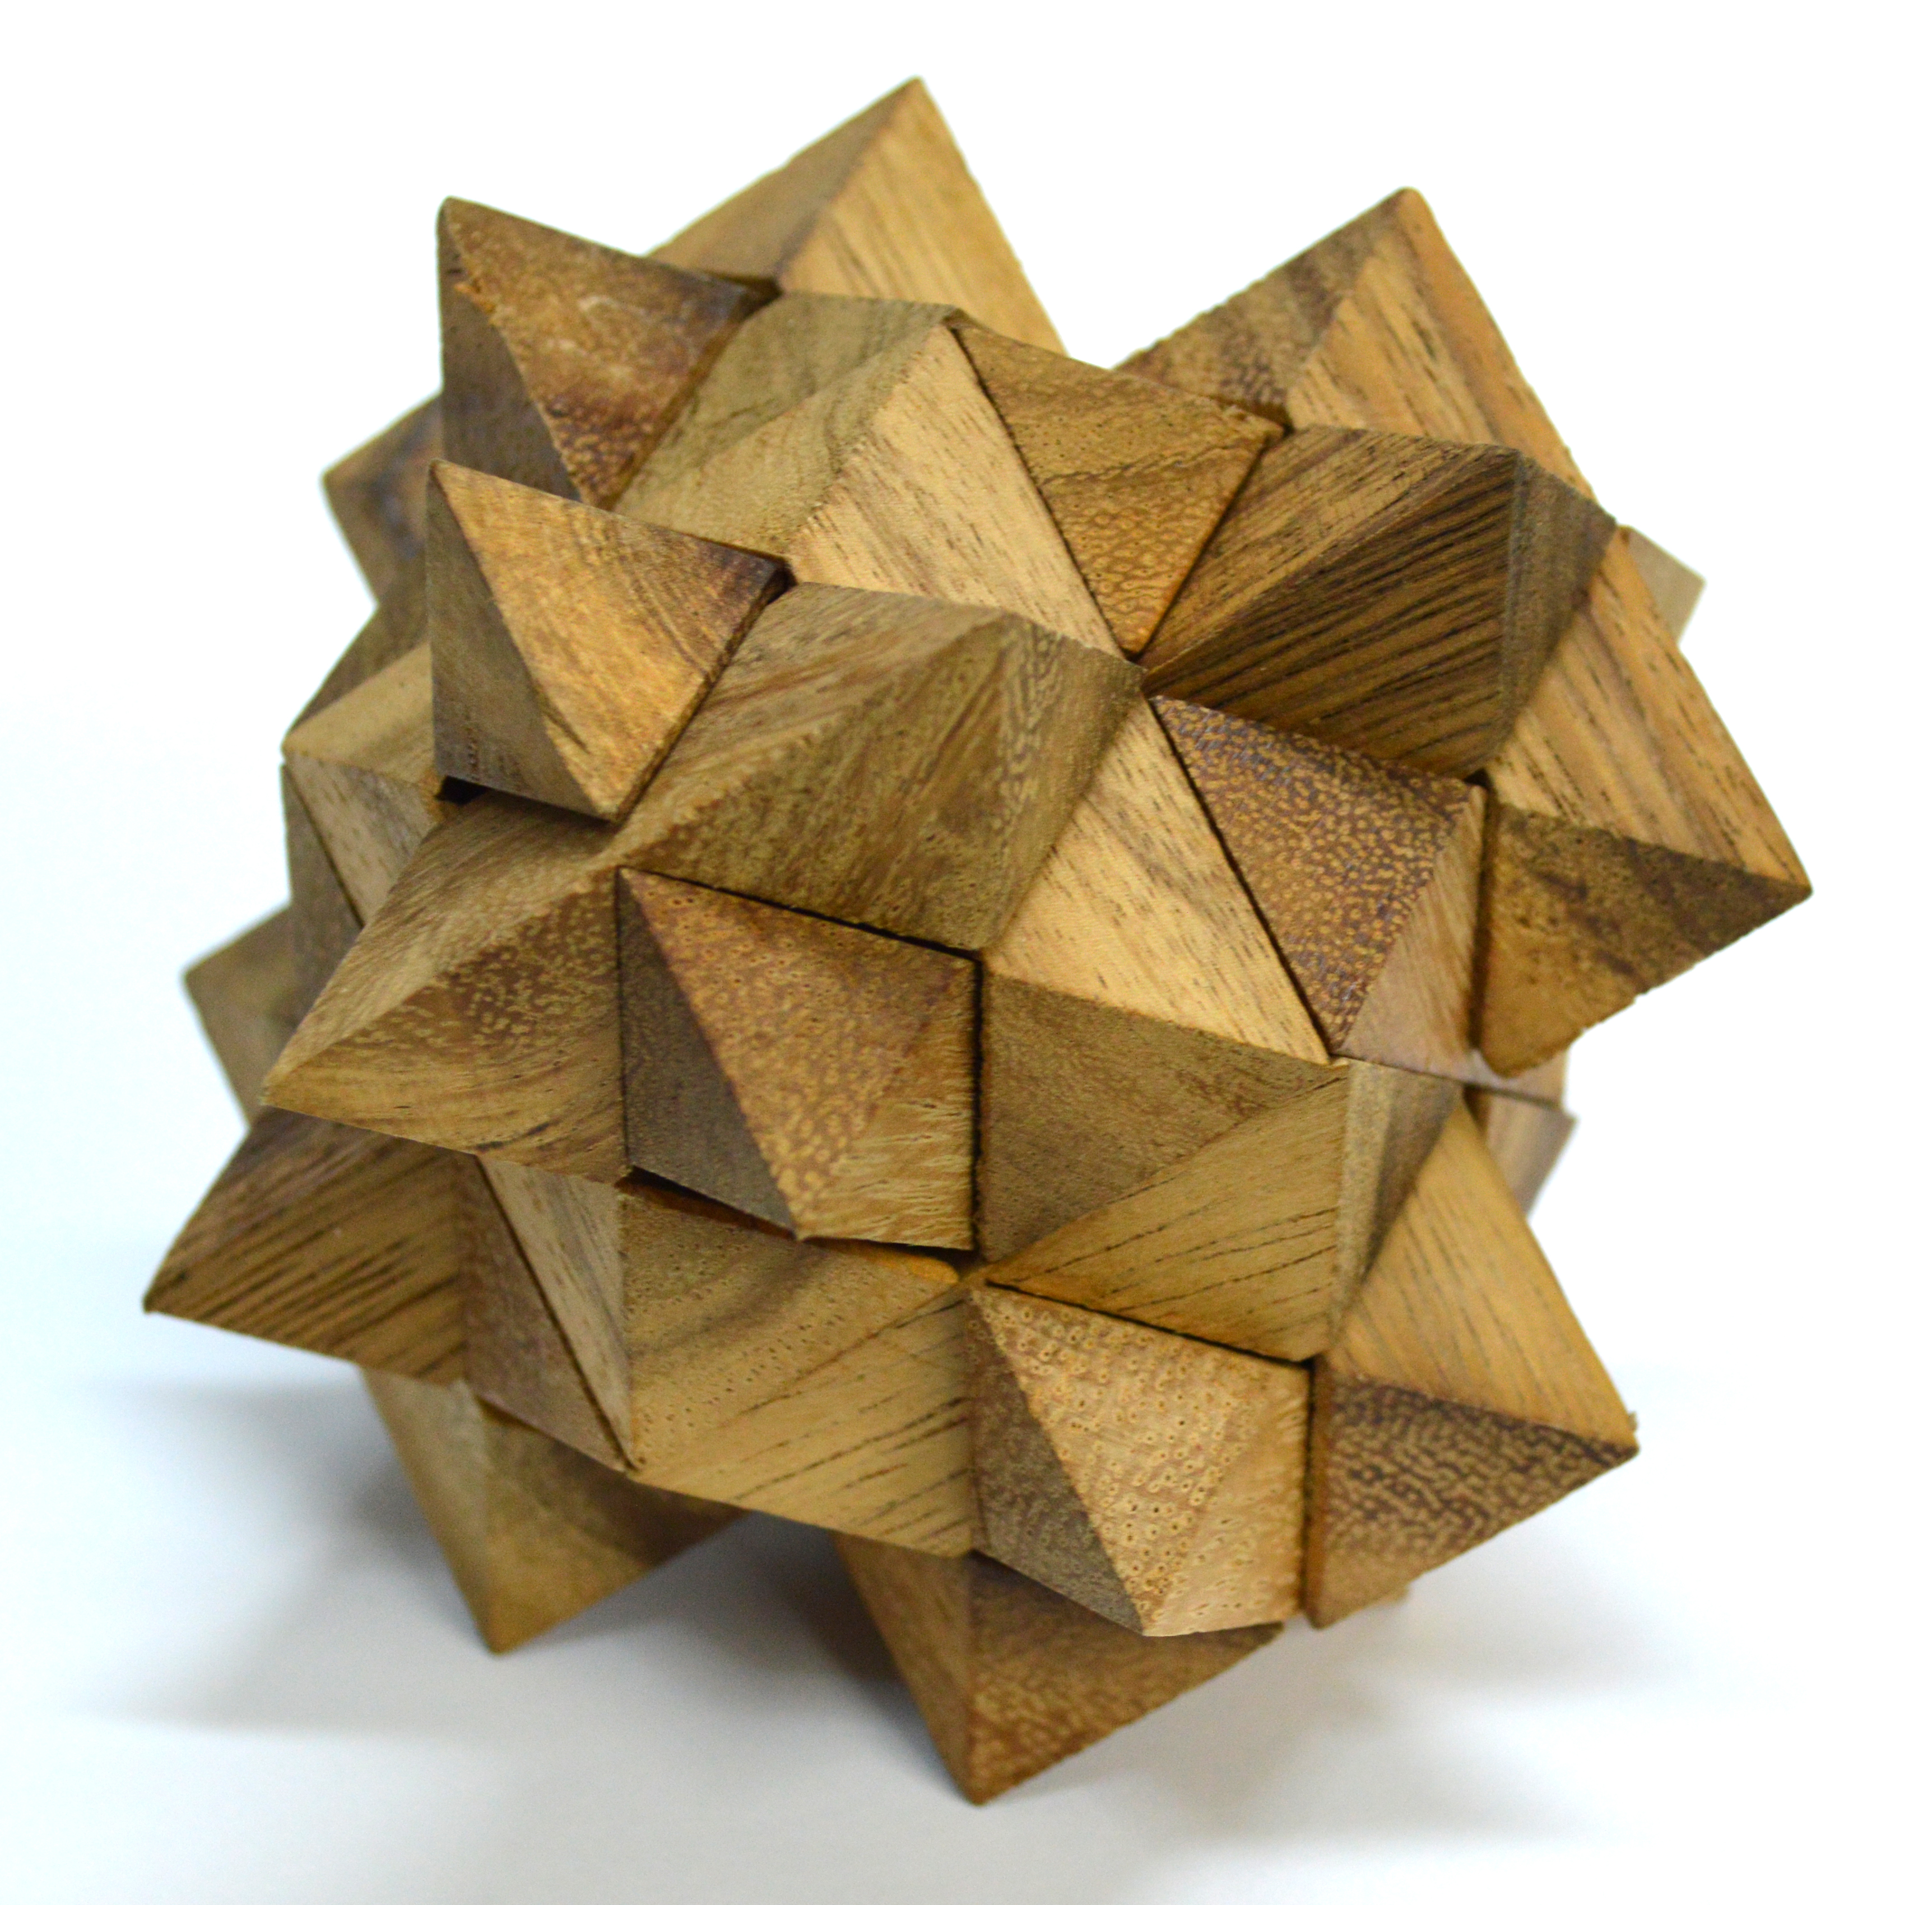 Файл:Giant Star Burr Puzzle jpg — Википедия